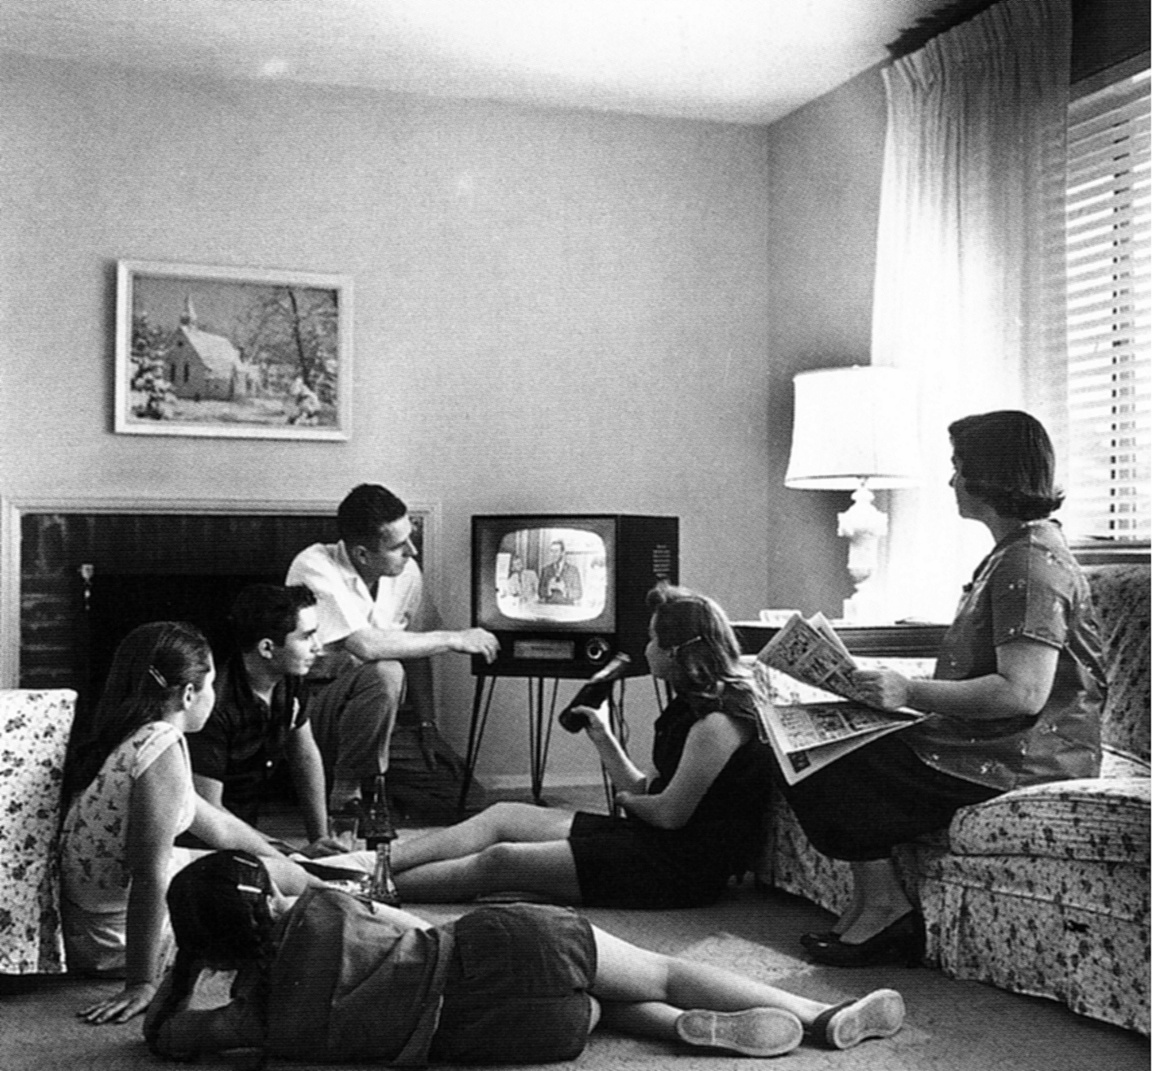 p7_High 5 TAH_American Family watching television 1958.jpg